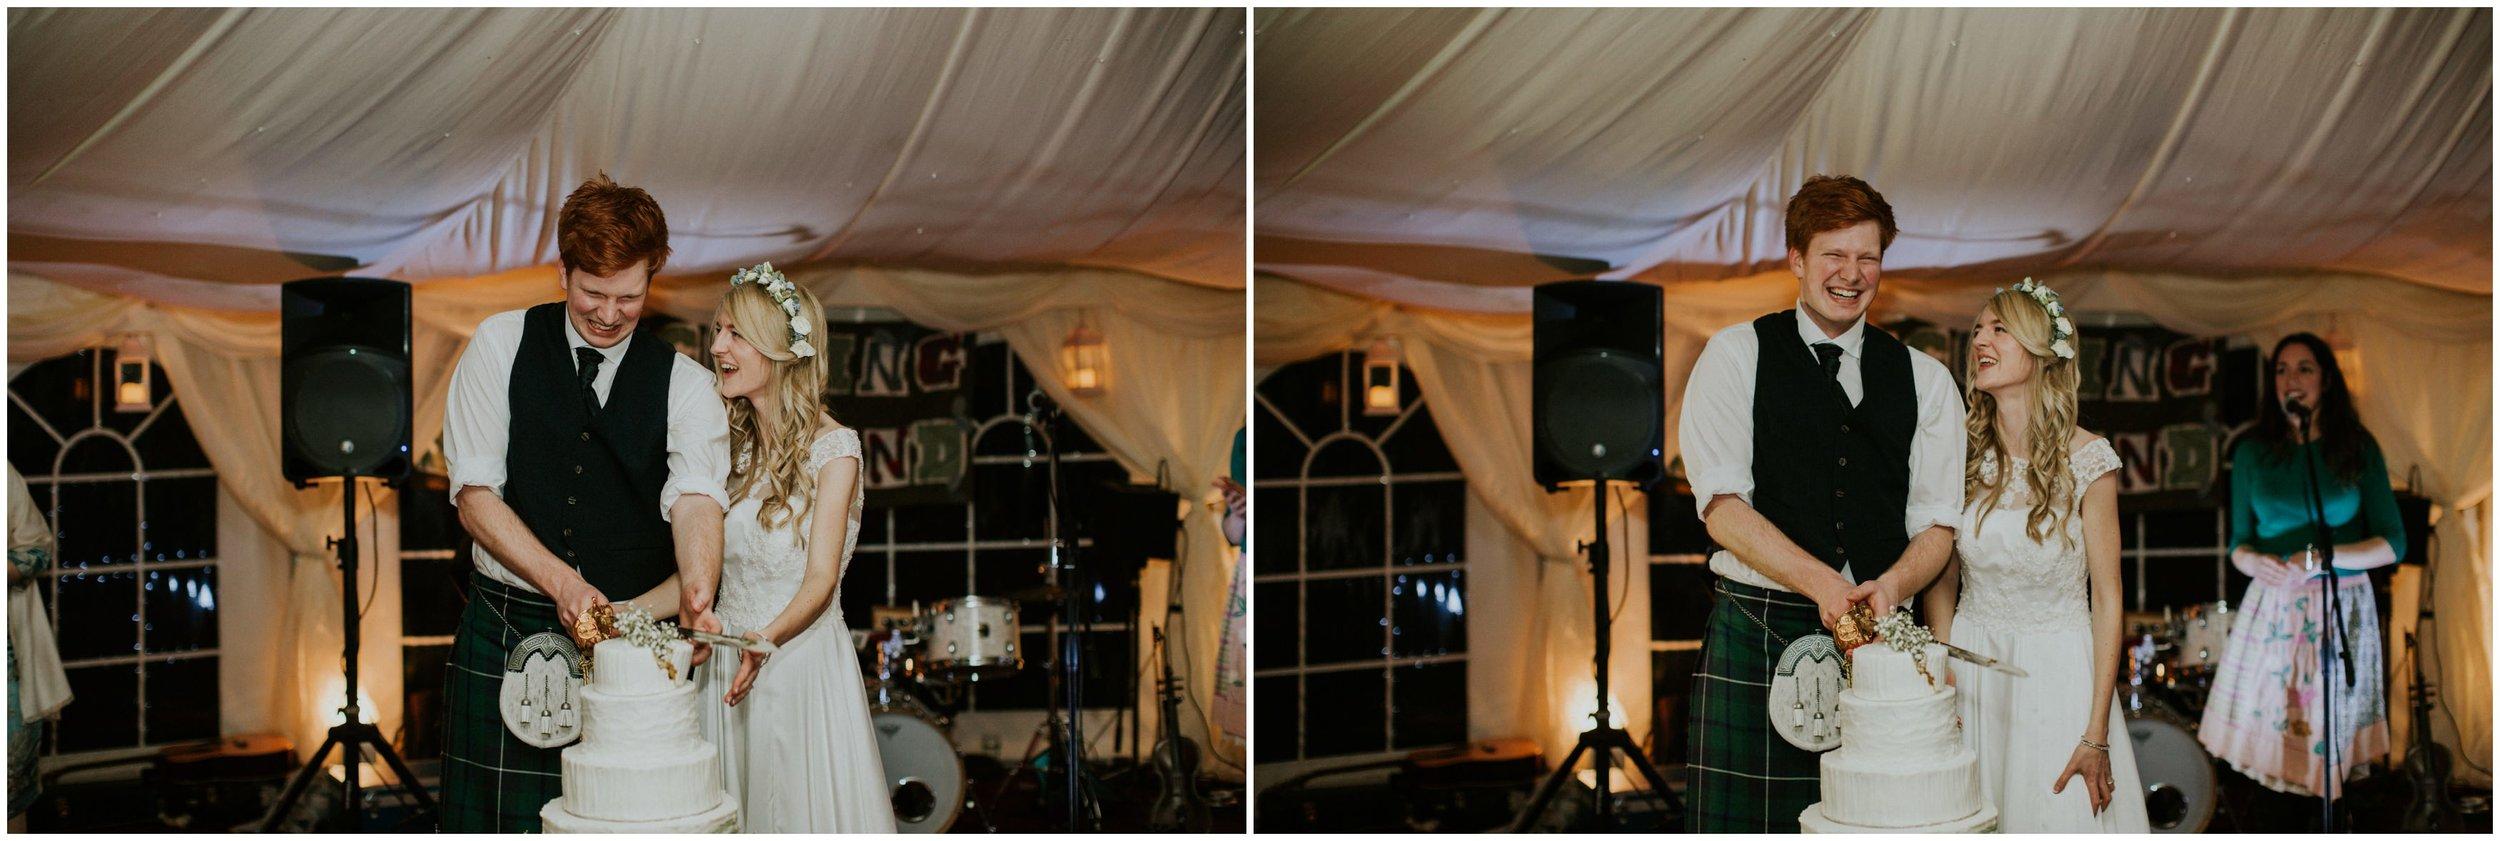 Photography 78 - Glasgow Wedding Photographer - Dave & Alana_0099.jpg